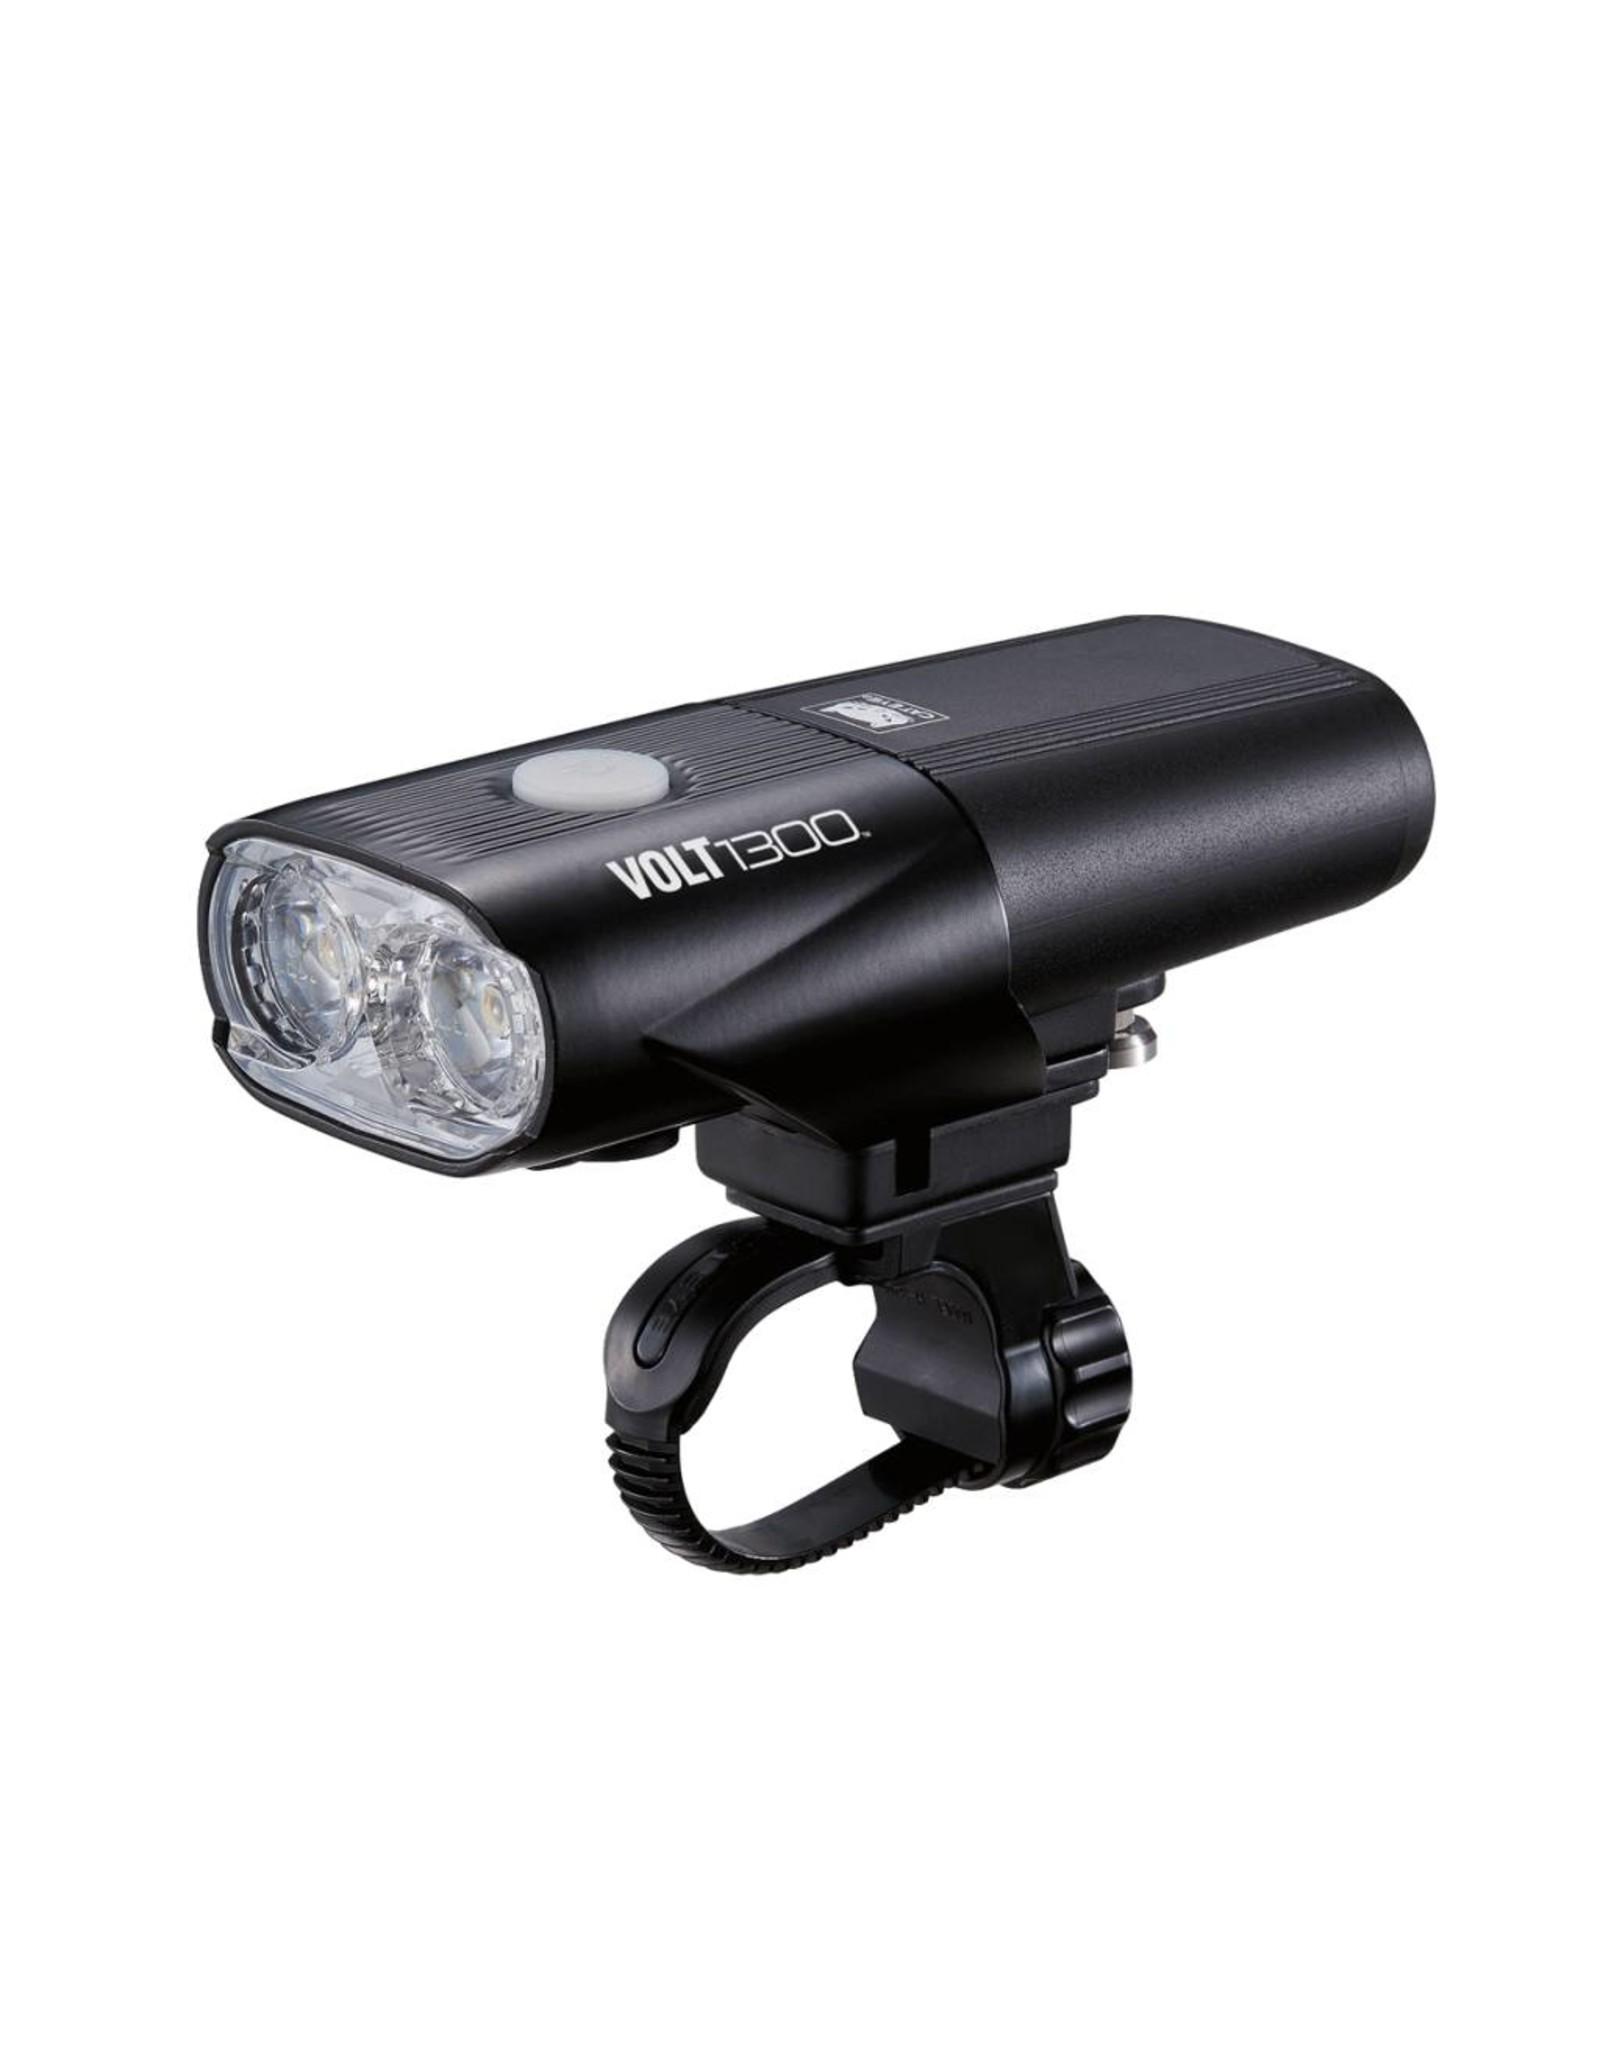 Cateye VOLT 1300 RC FRONT LIGHT: